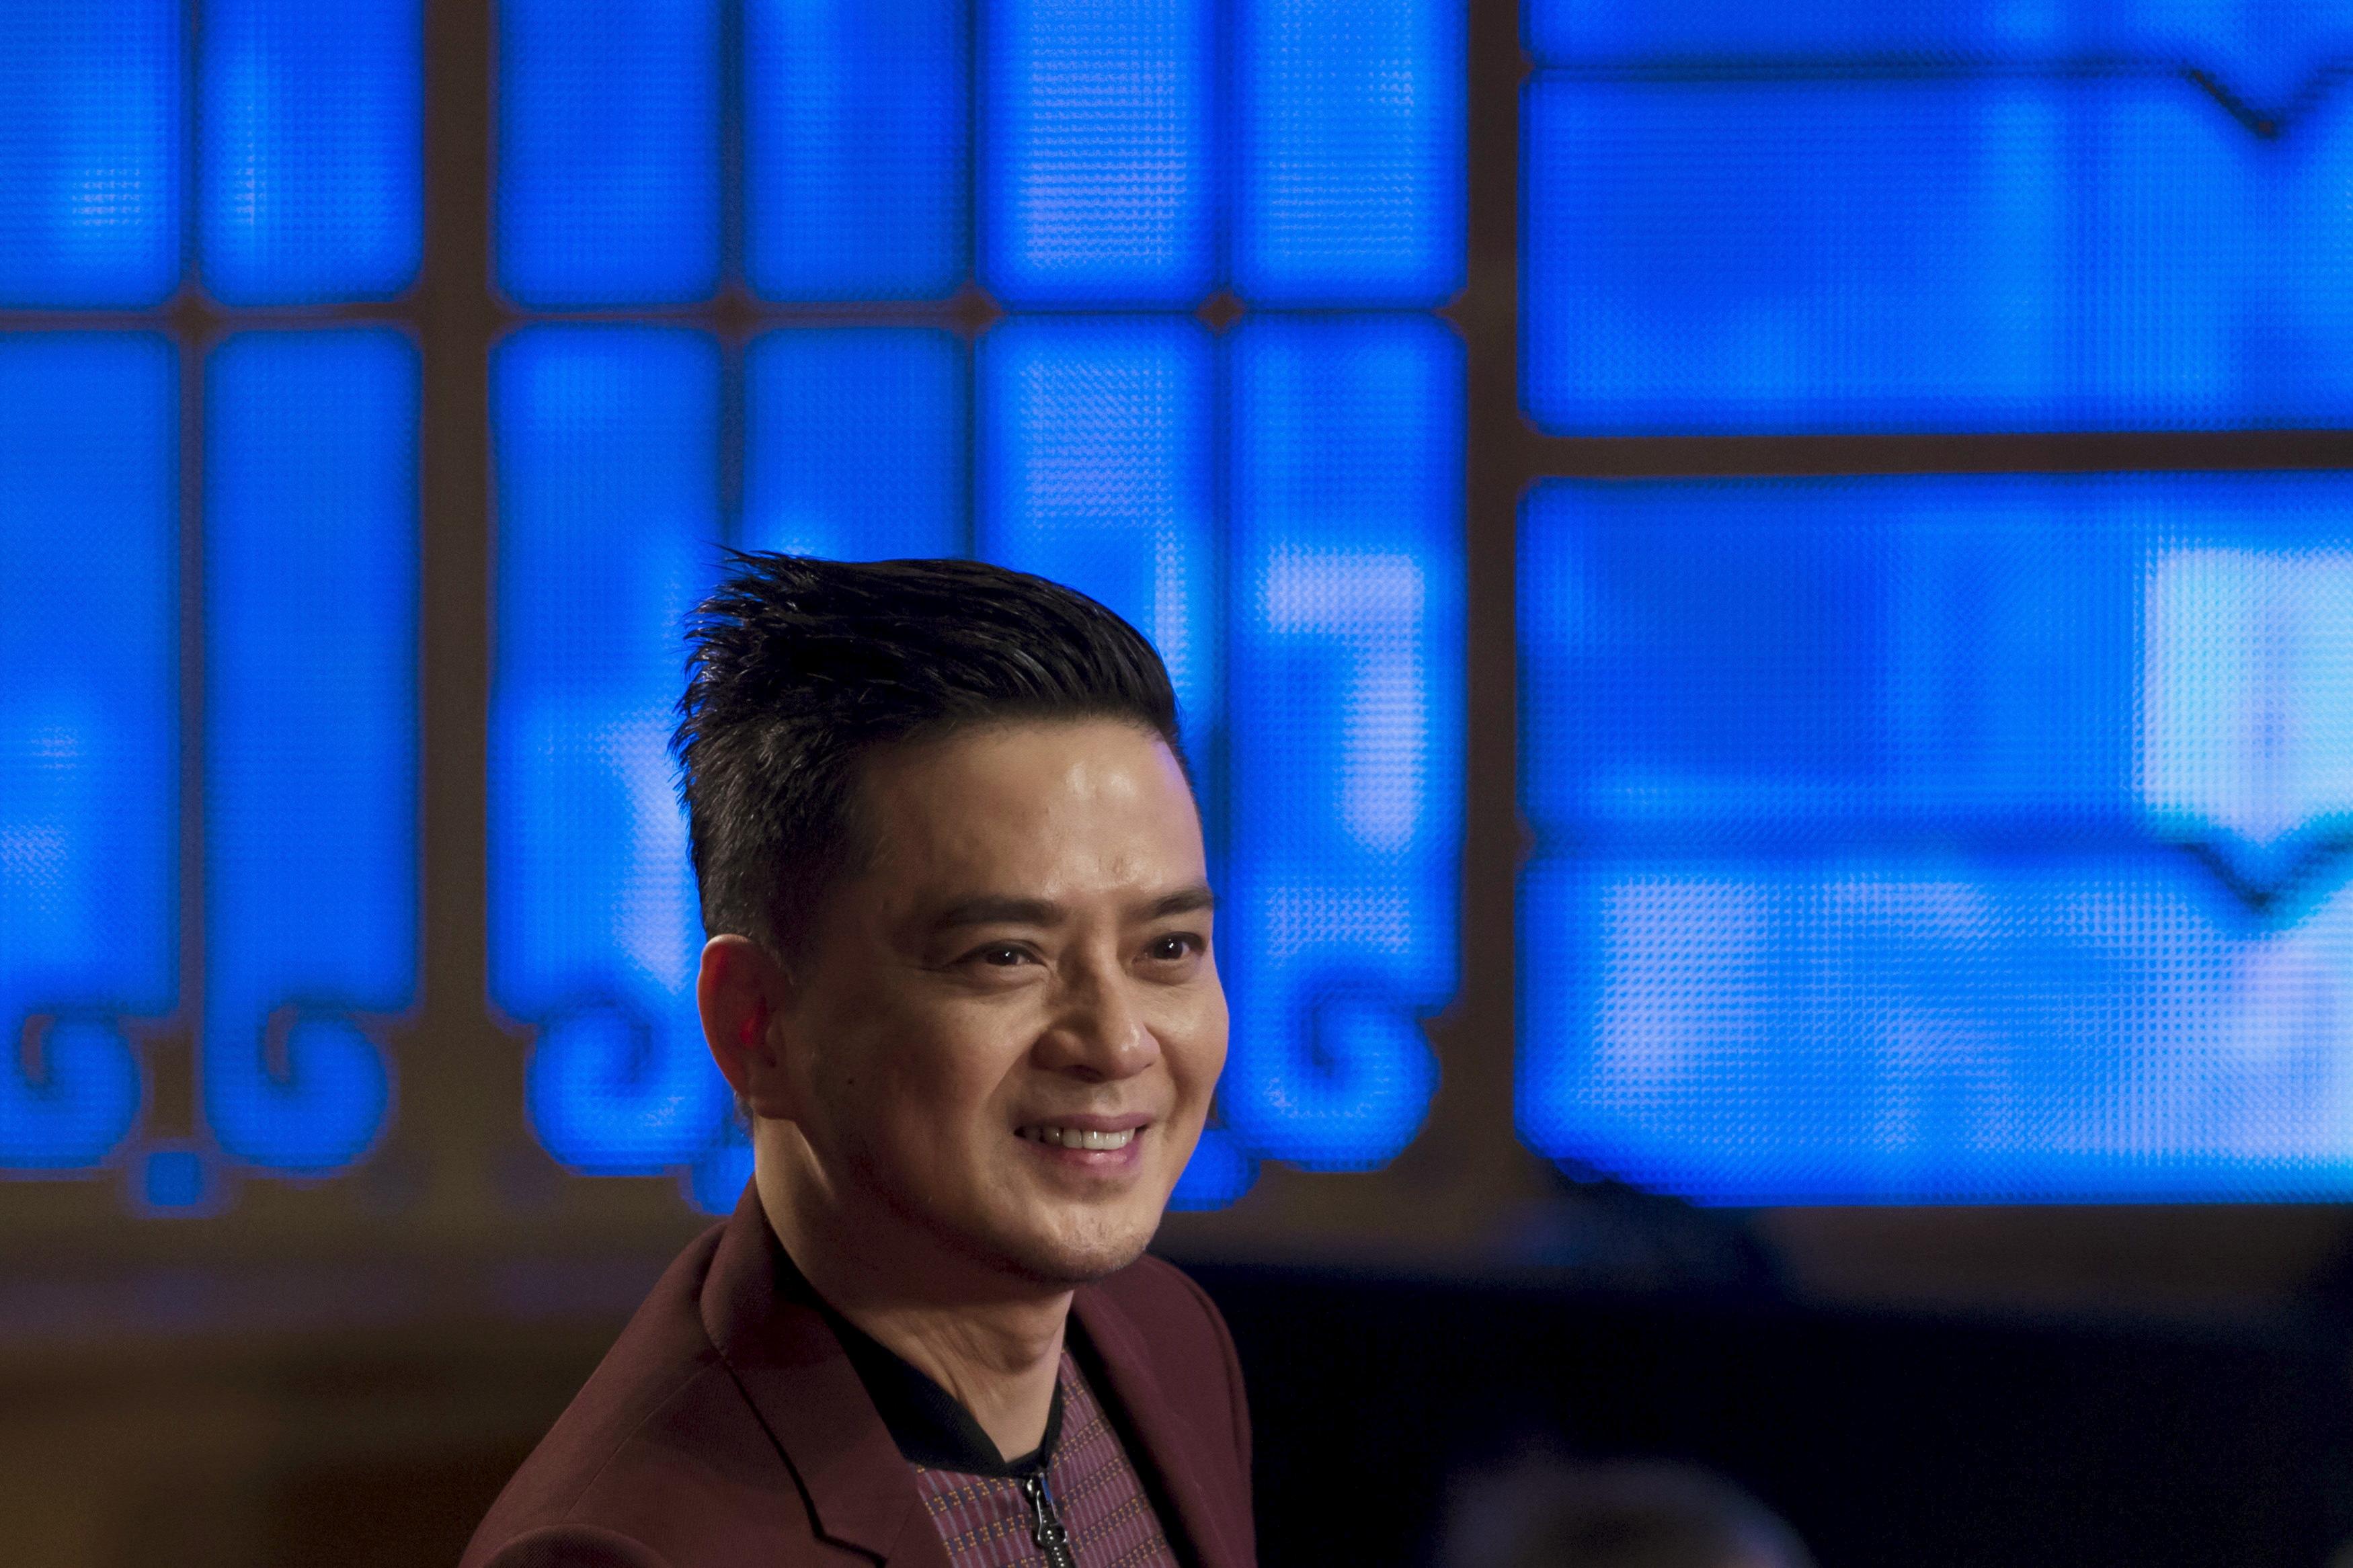 Hong Kong singer Anthony Wong Yiu-Ming attends the Hong Kong Film Awards April 19, 2015. REUTERS/Tyrone Siu